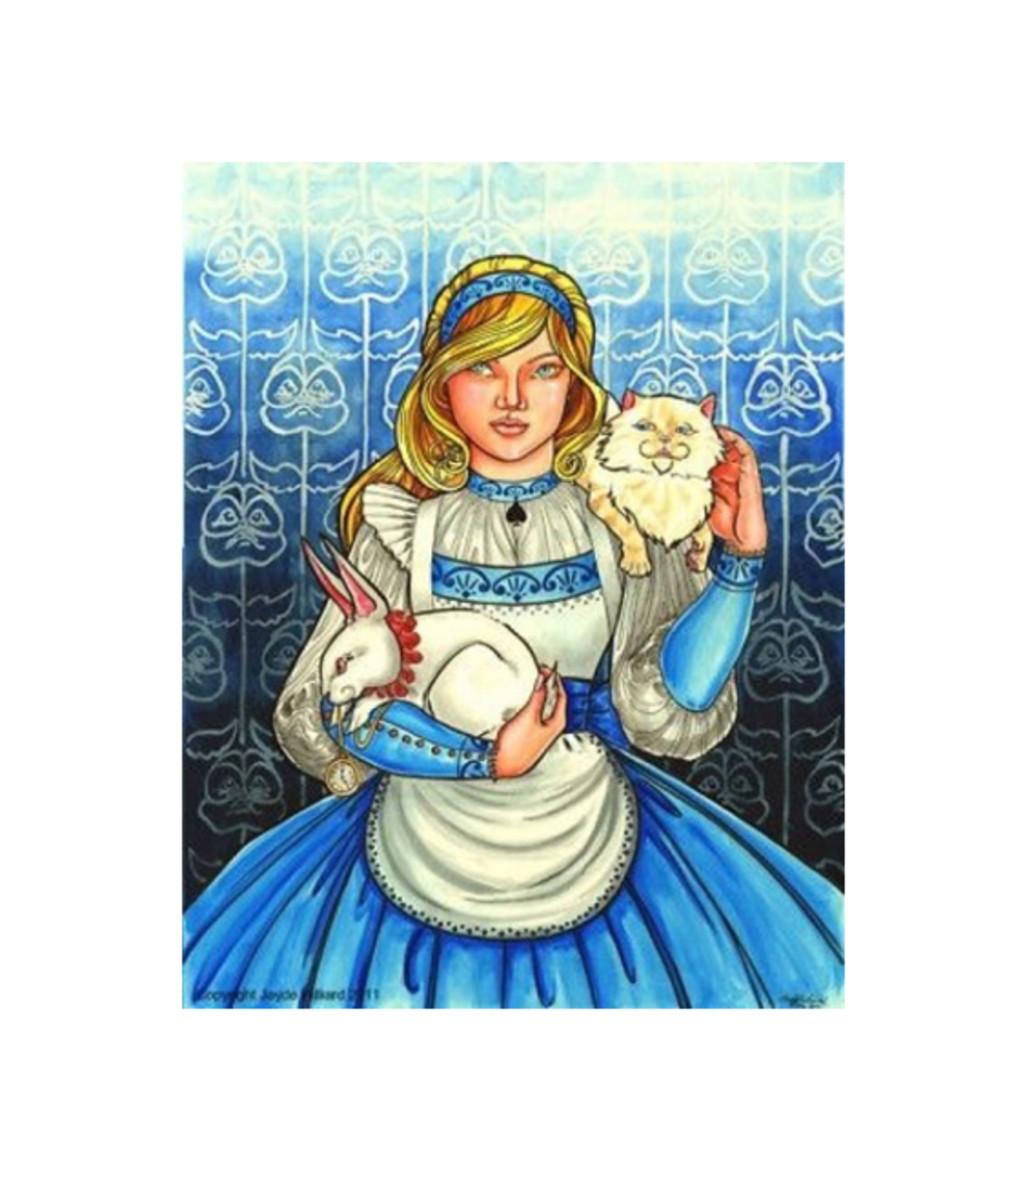 """Alice in Wonderland"" by Jayde Hilliard"